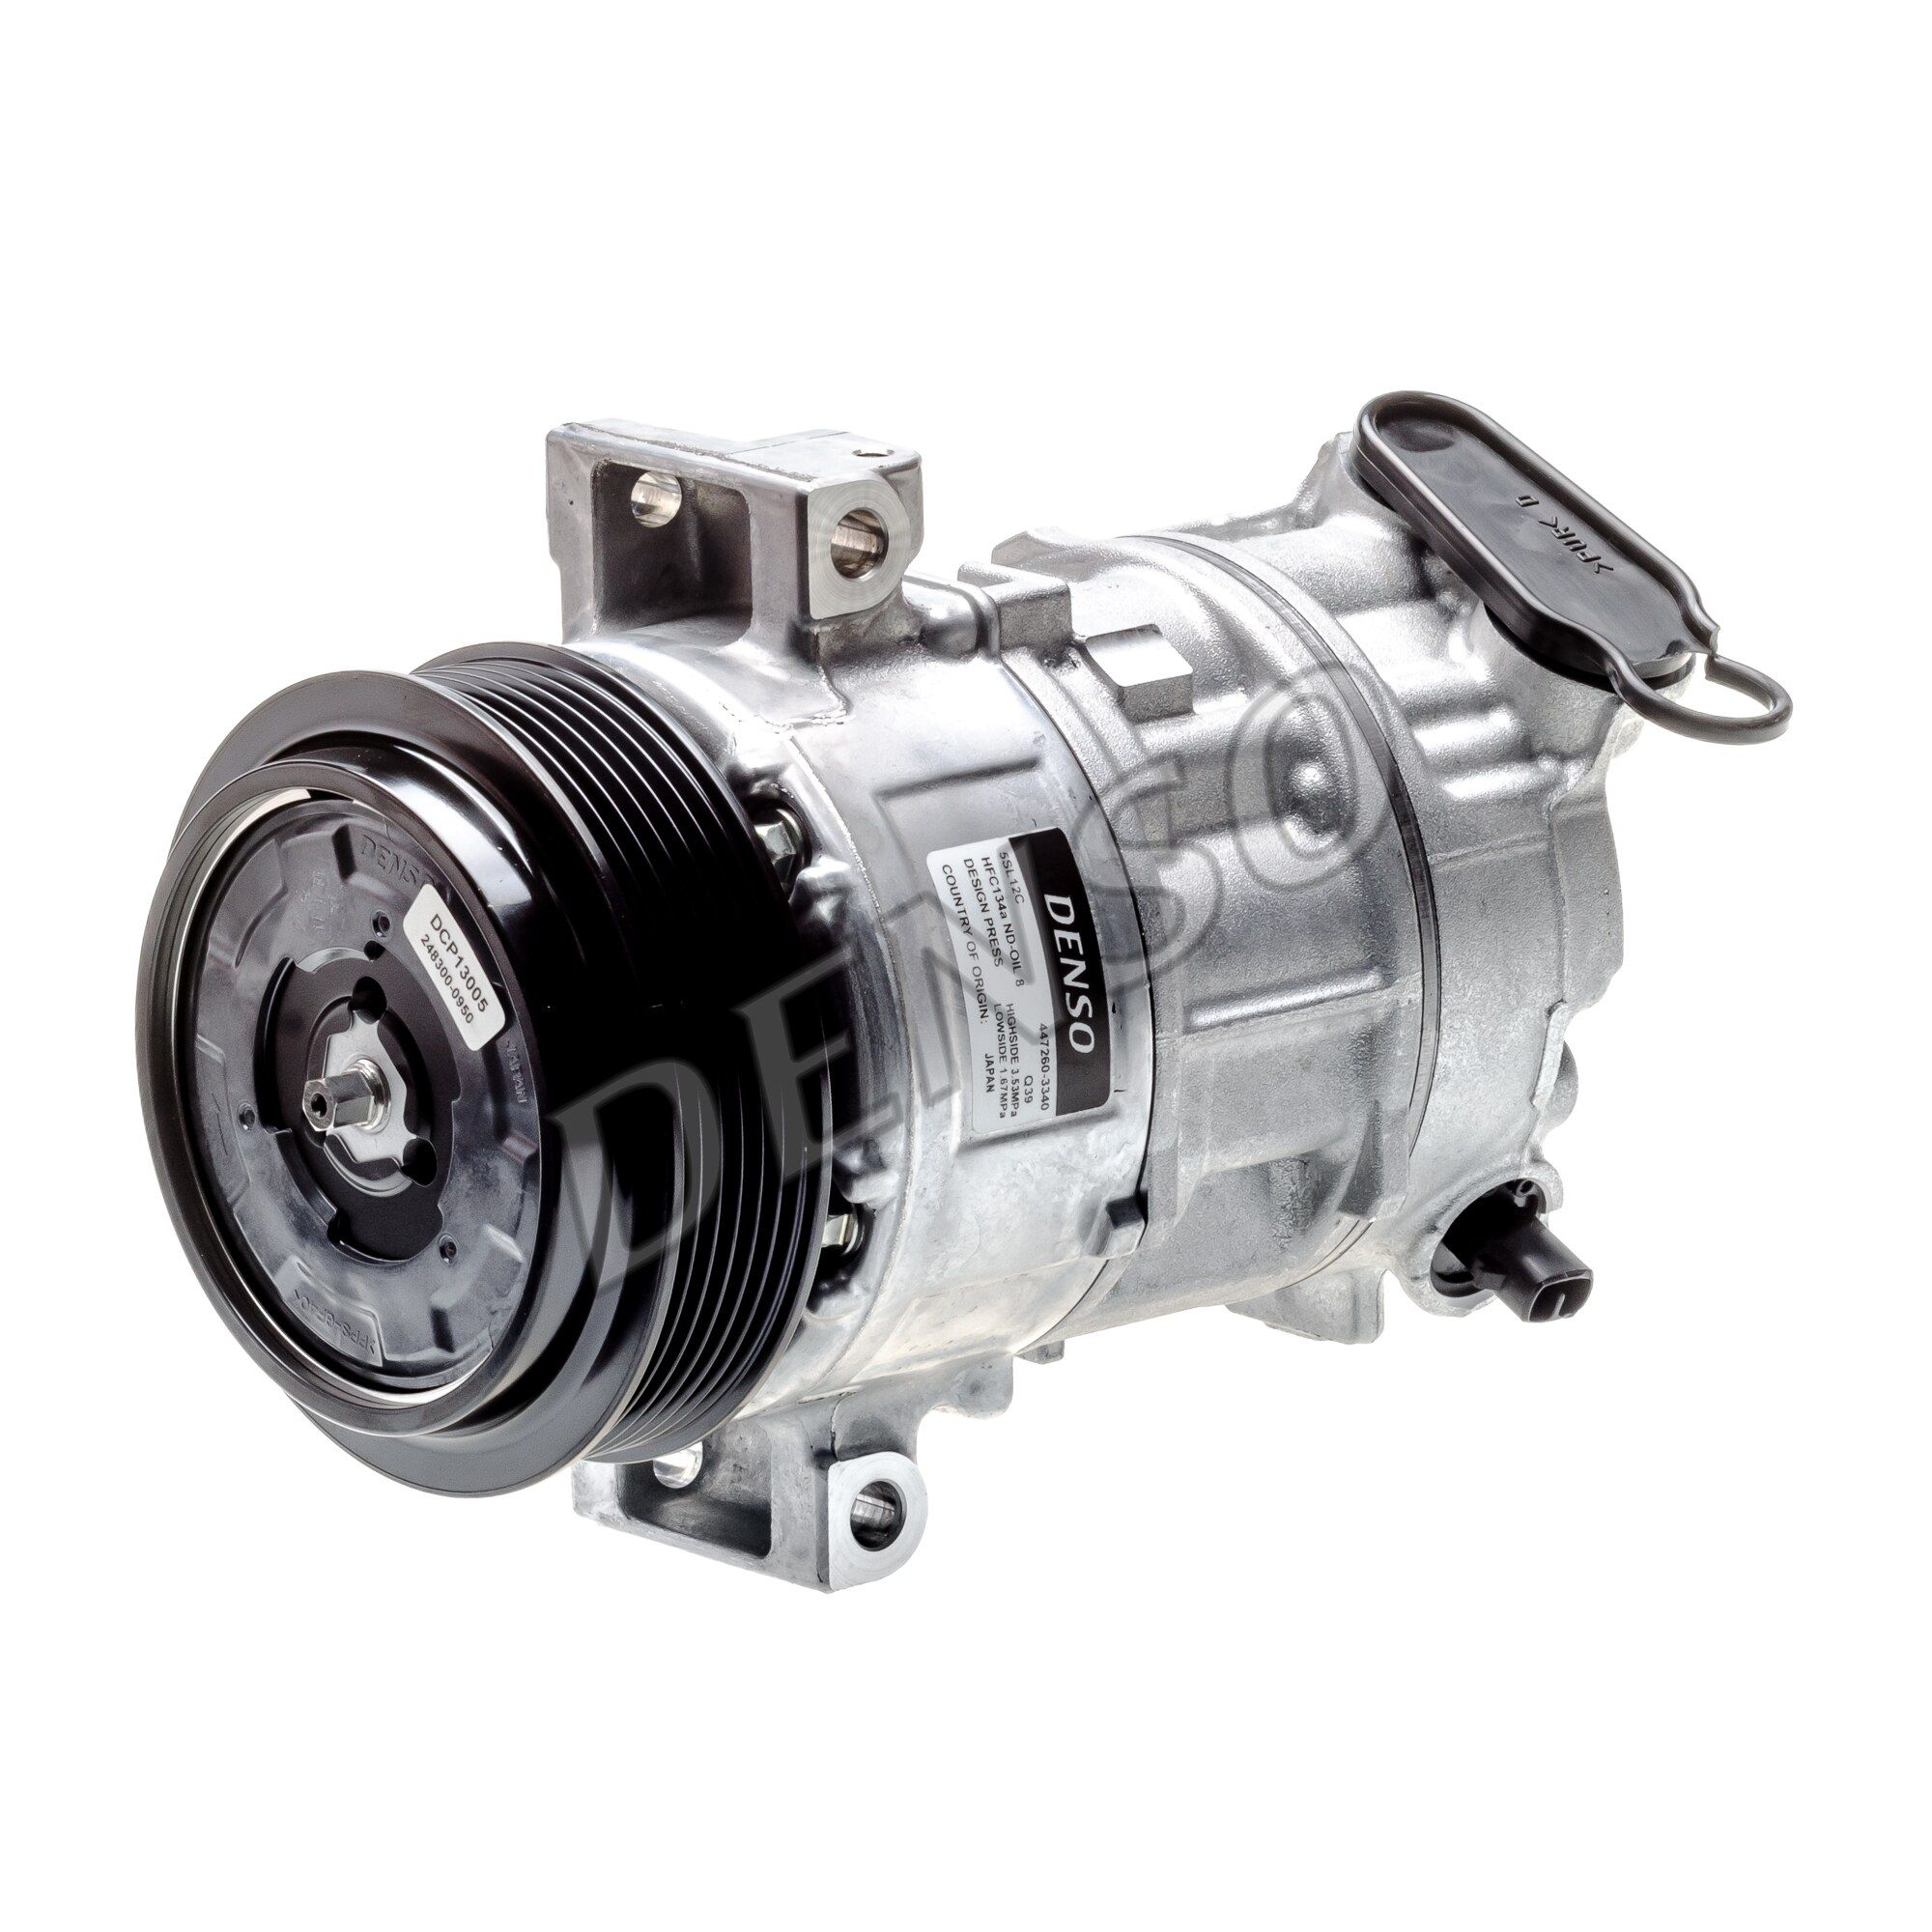 Original FIAT Klimakompressor DCP13005